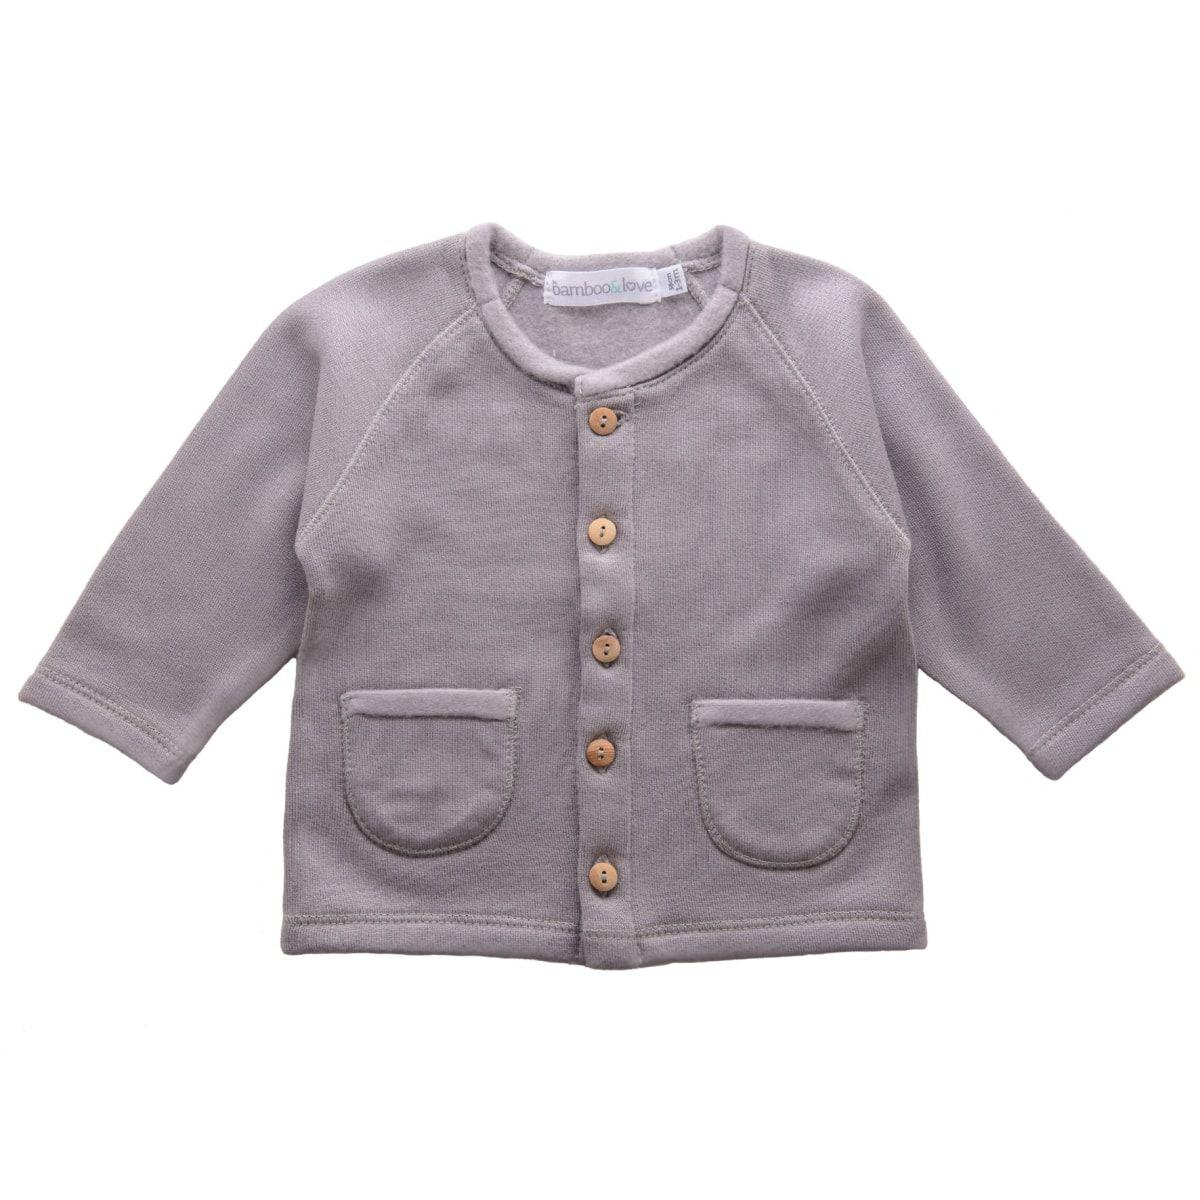 Grey Fleece Cardigan | Bamboo&Love at @Kide | AW 17 | Newborn ...